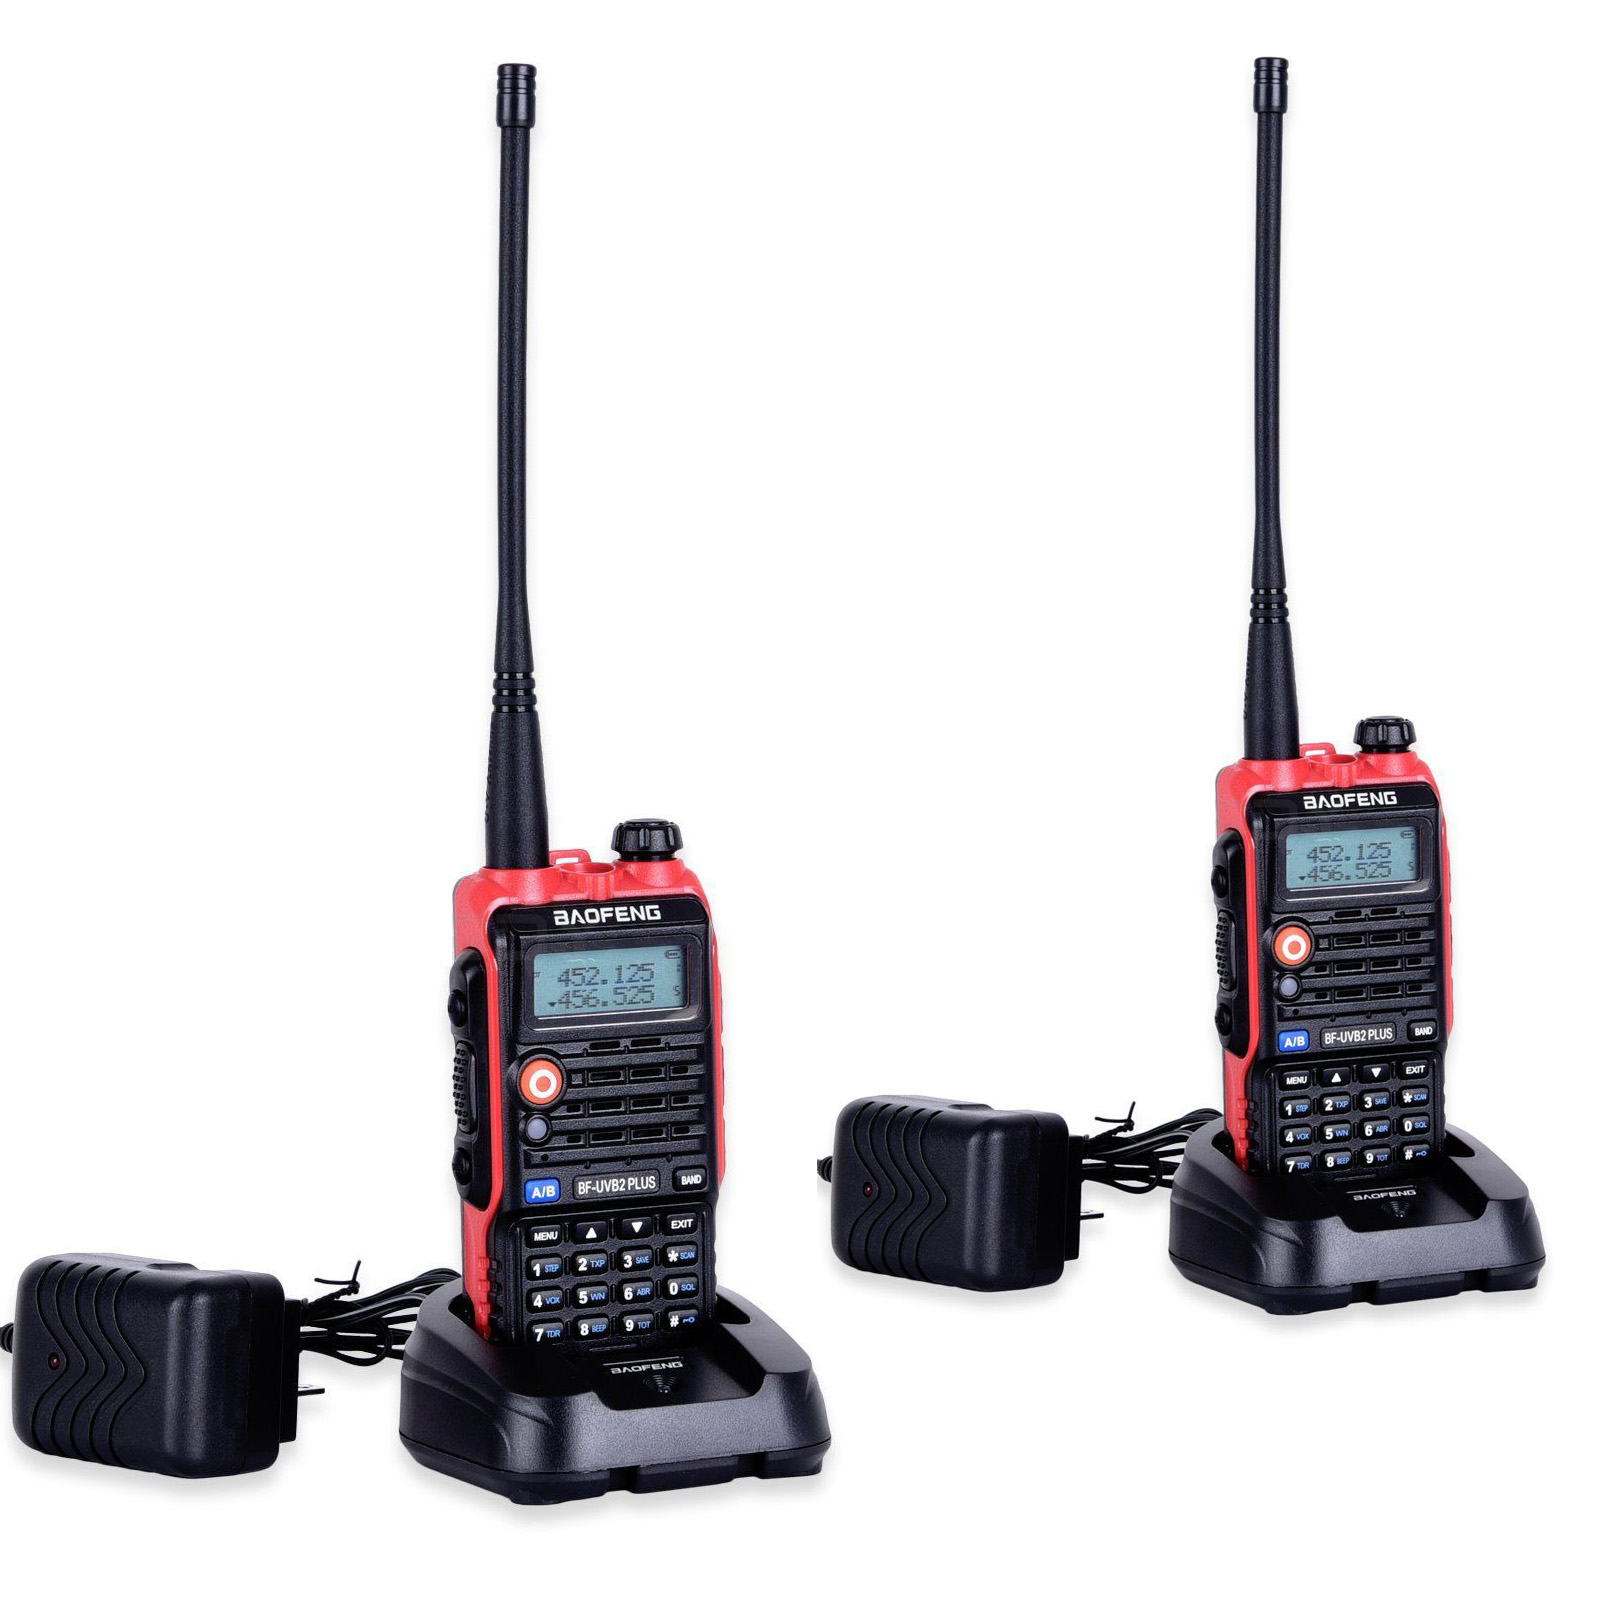 2 STUKS LED Light 4800mah Batterij Bf Uvb2 Baofeng Uvb2 Plus Voor WalkieTalkie Cb Radio Mobiele Comunicador High Power Baofeng 8w b2-in Portofoon van Mobiele telefoons & telecommunicatie op AliExpress - 11.11_Dubbel 11Vrijgezellendag 1